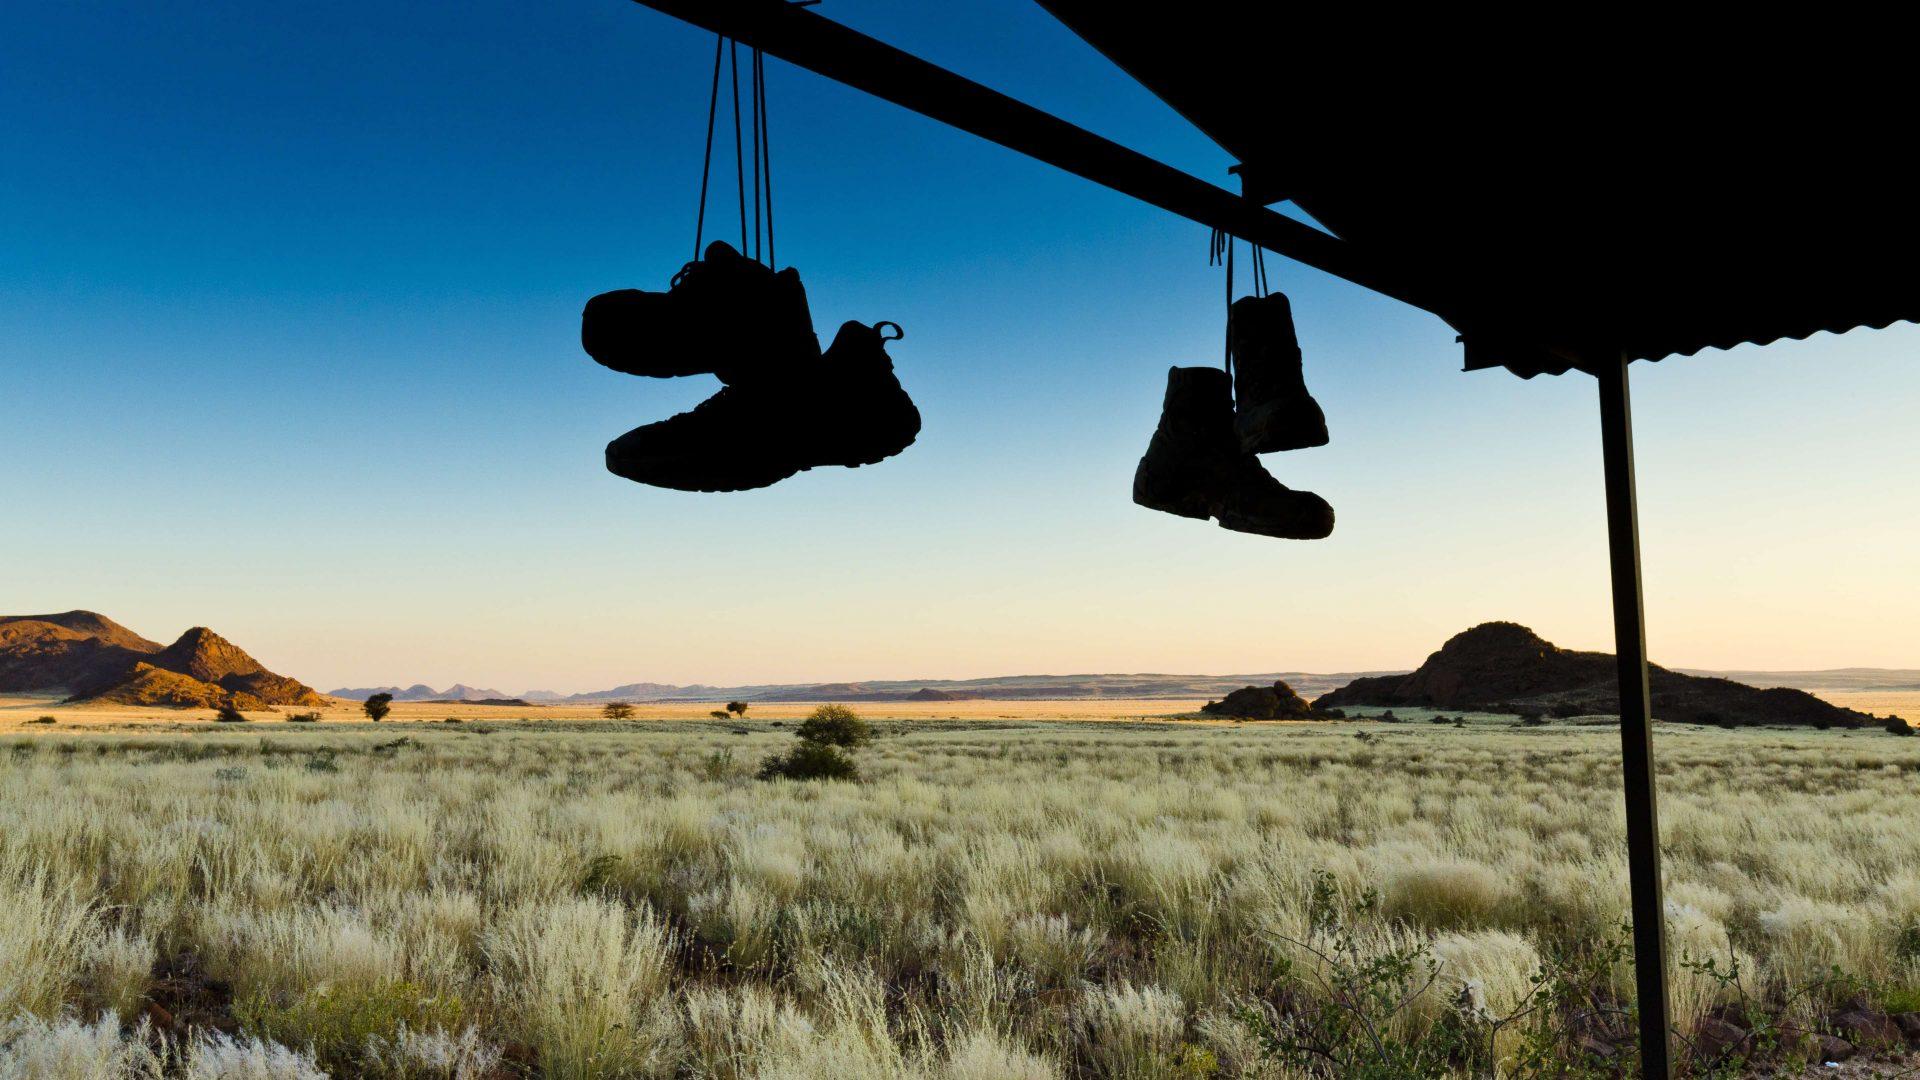 Absolut Tours & Safaris 1314, Wikinger Reisen. Hiking Tour of Namibia. April / May 2014